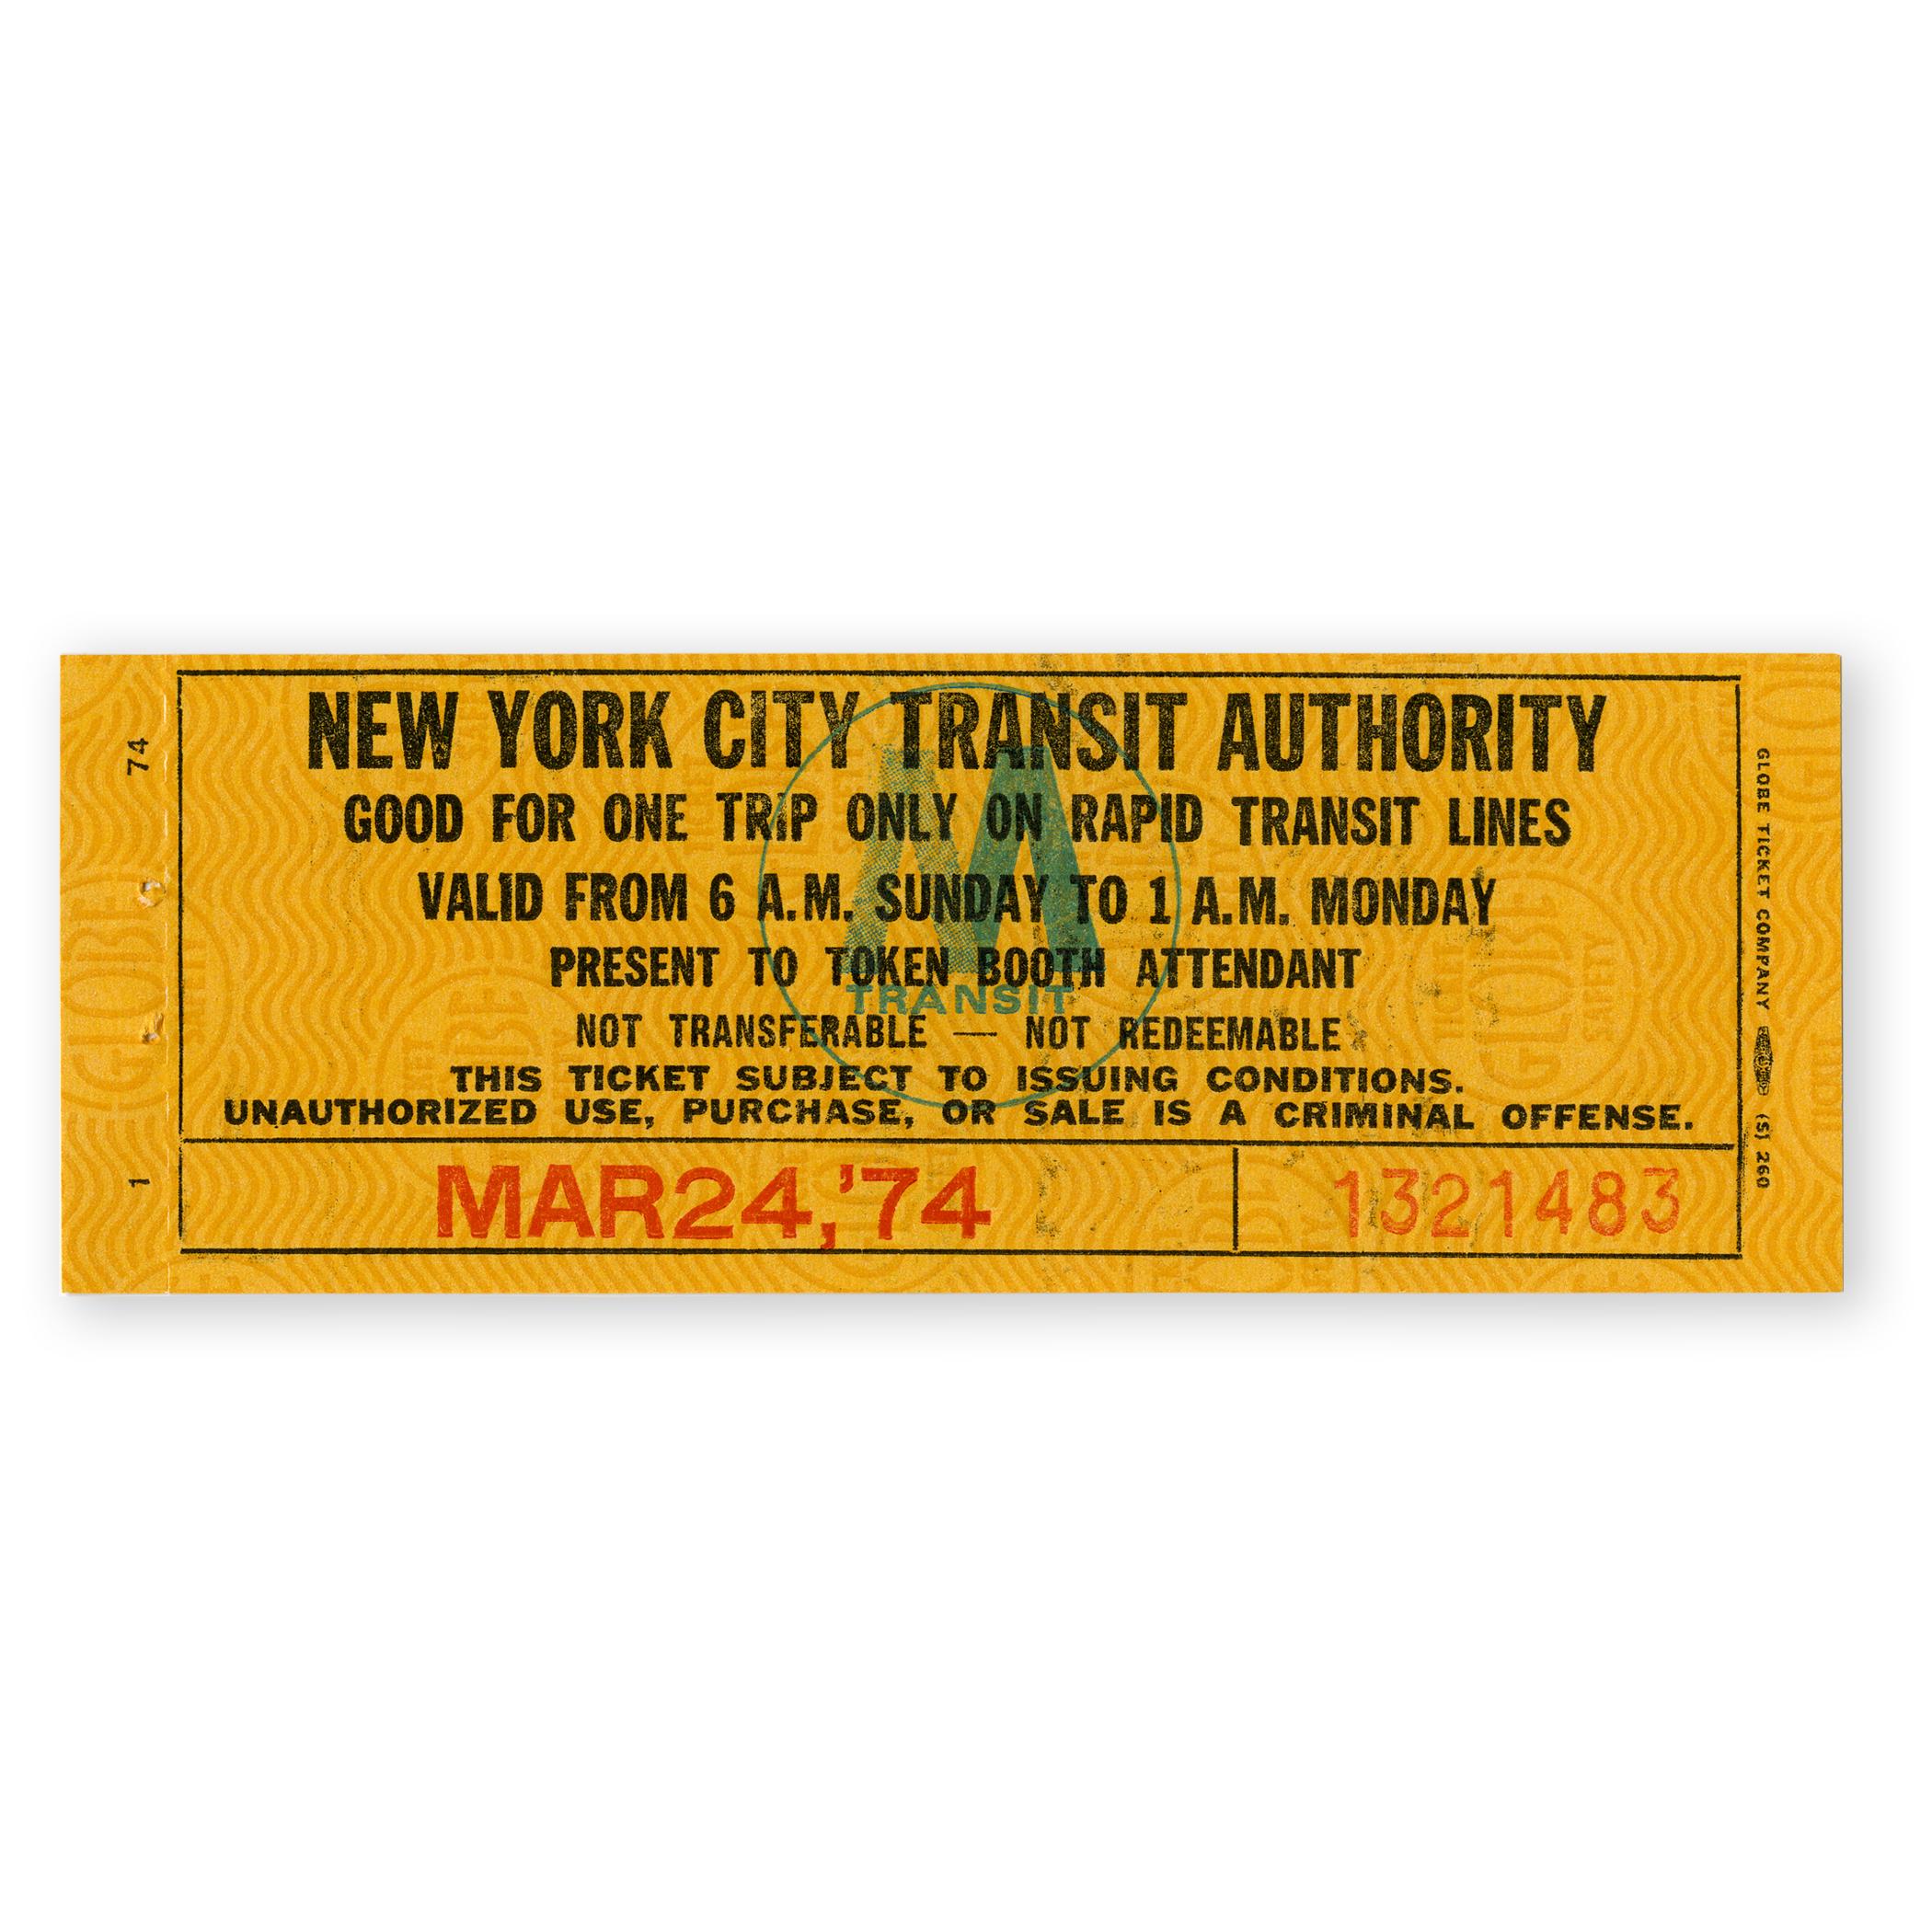 the_nycta_project_nycta_Subway_Half-Fare Sunday_Tickets_1974.jpg